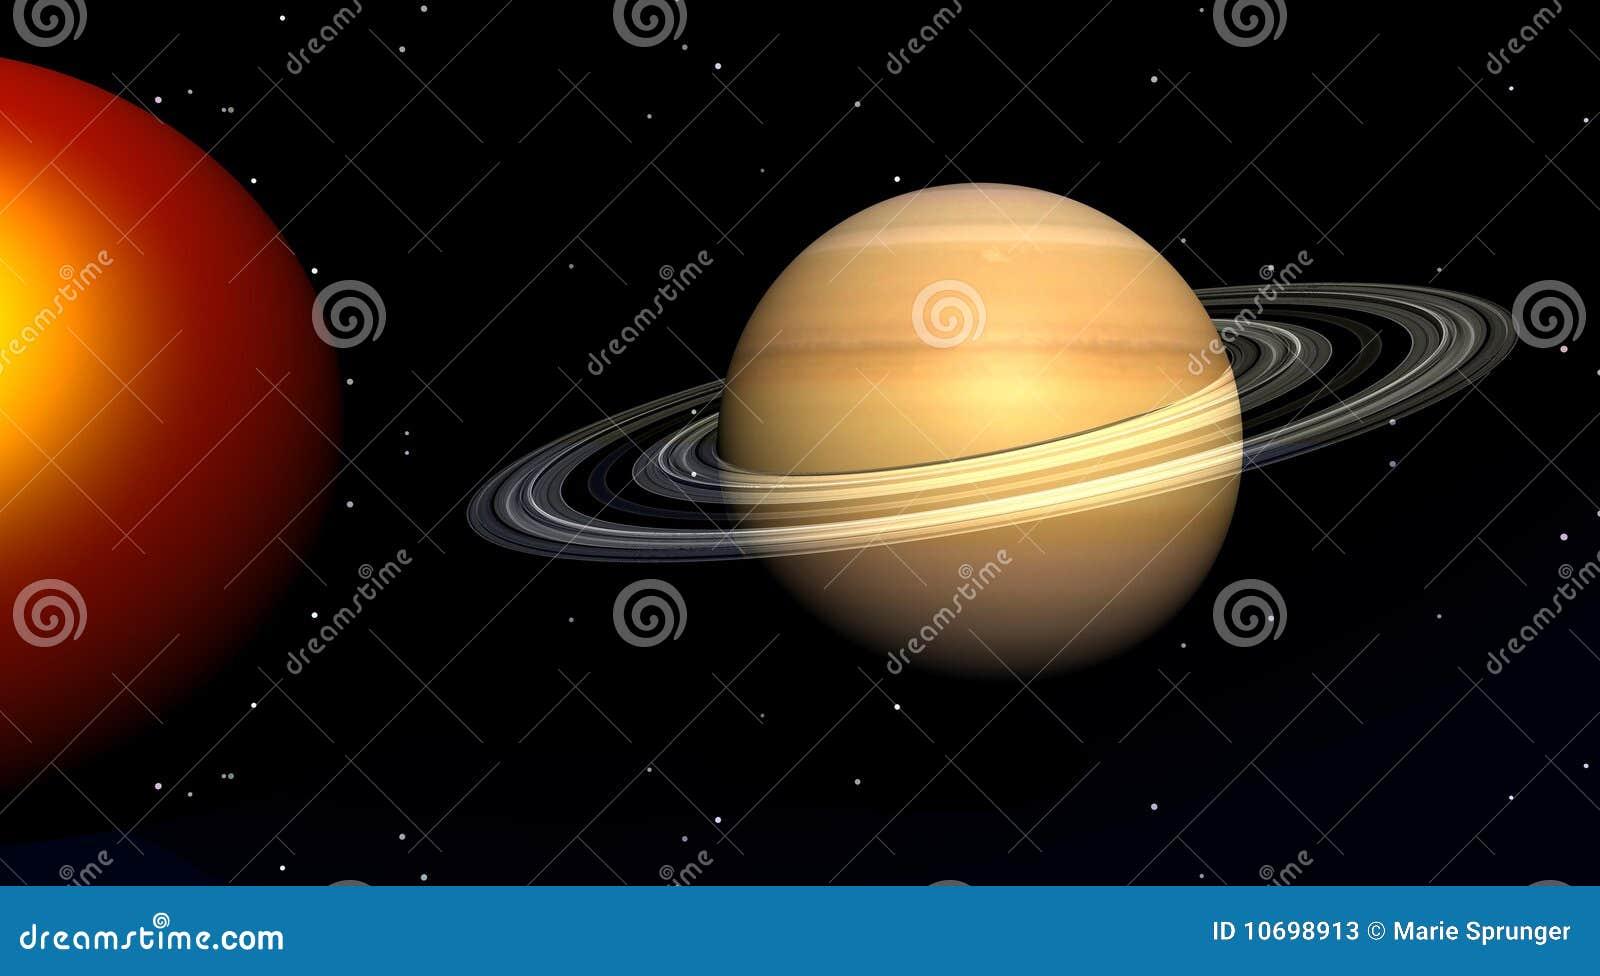 Zon en Saturnus